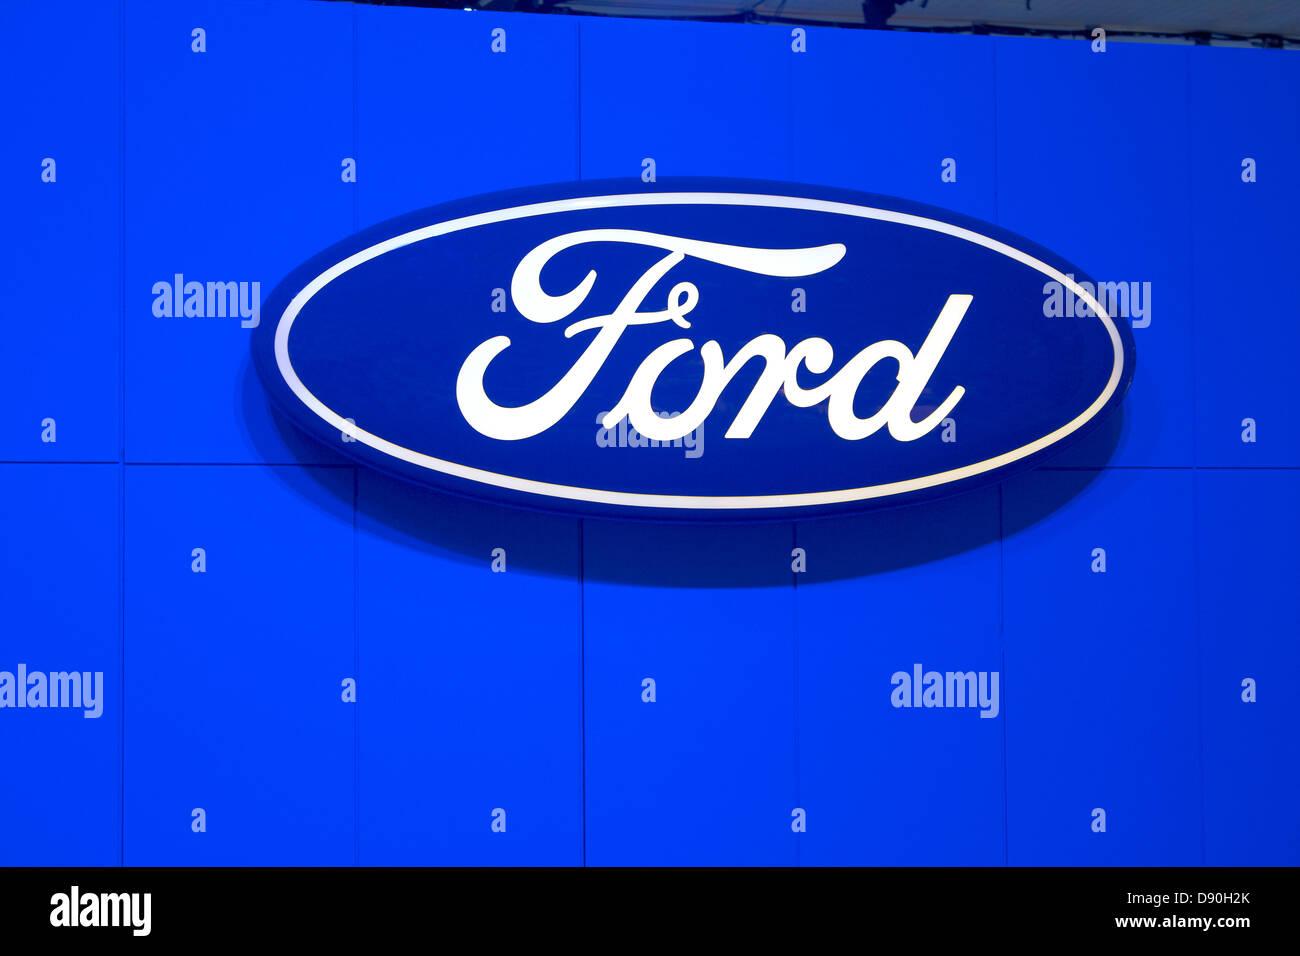 Ford Automobile logo - Stock Image